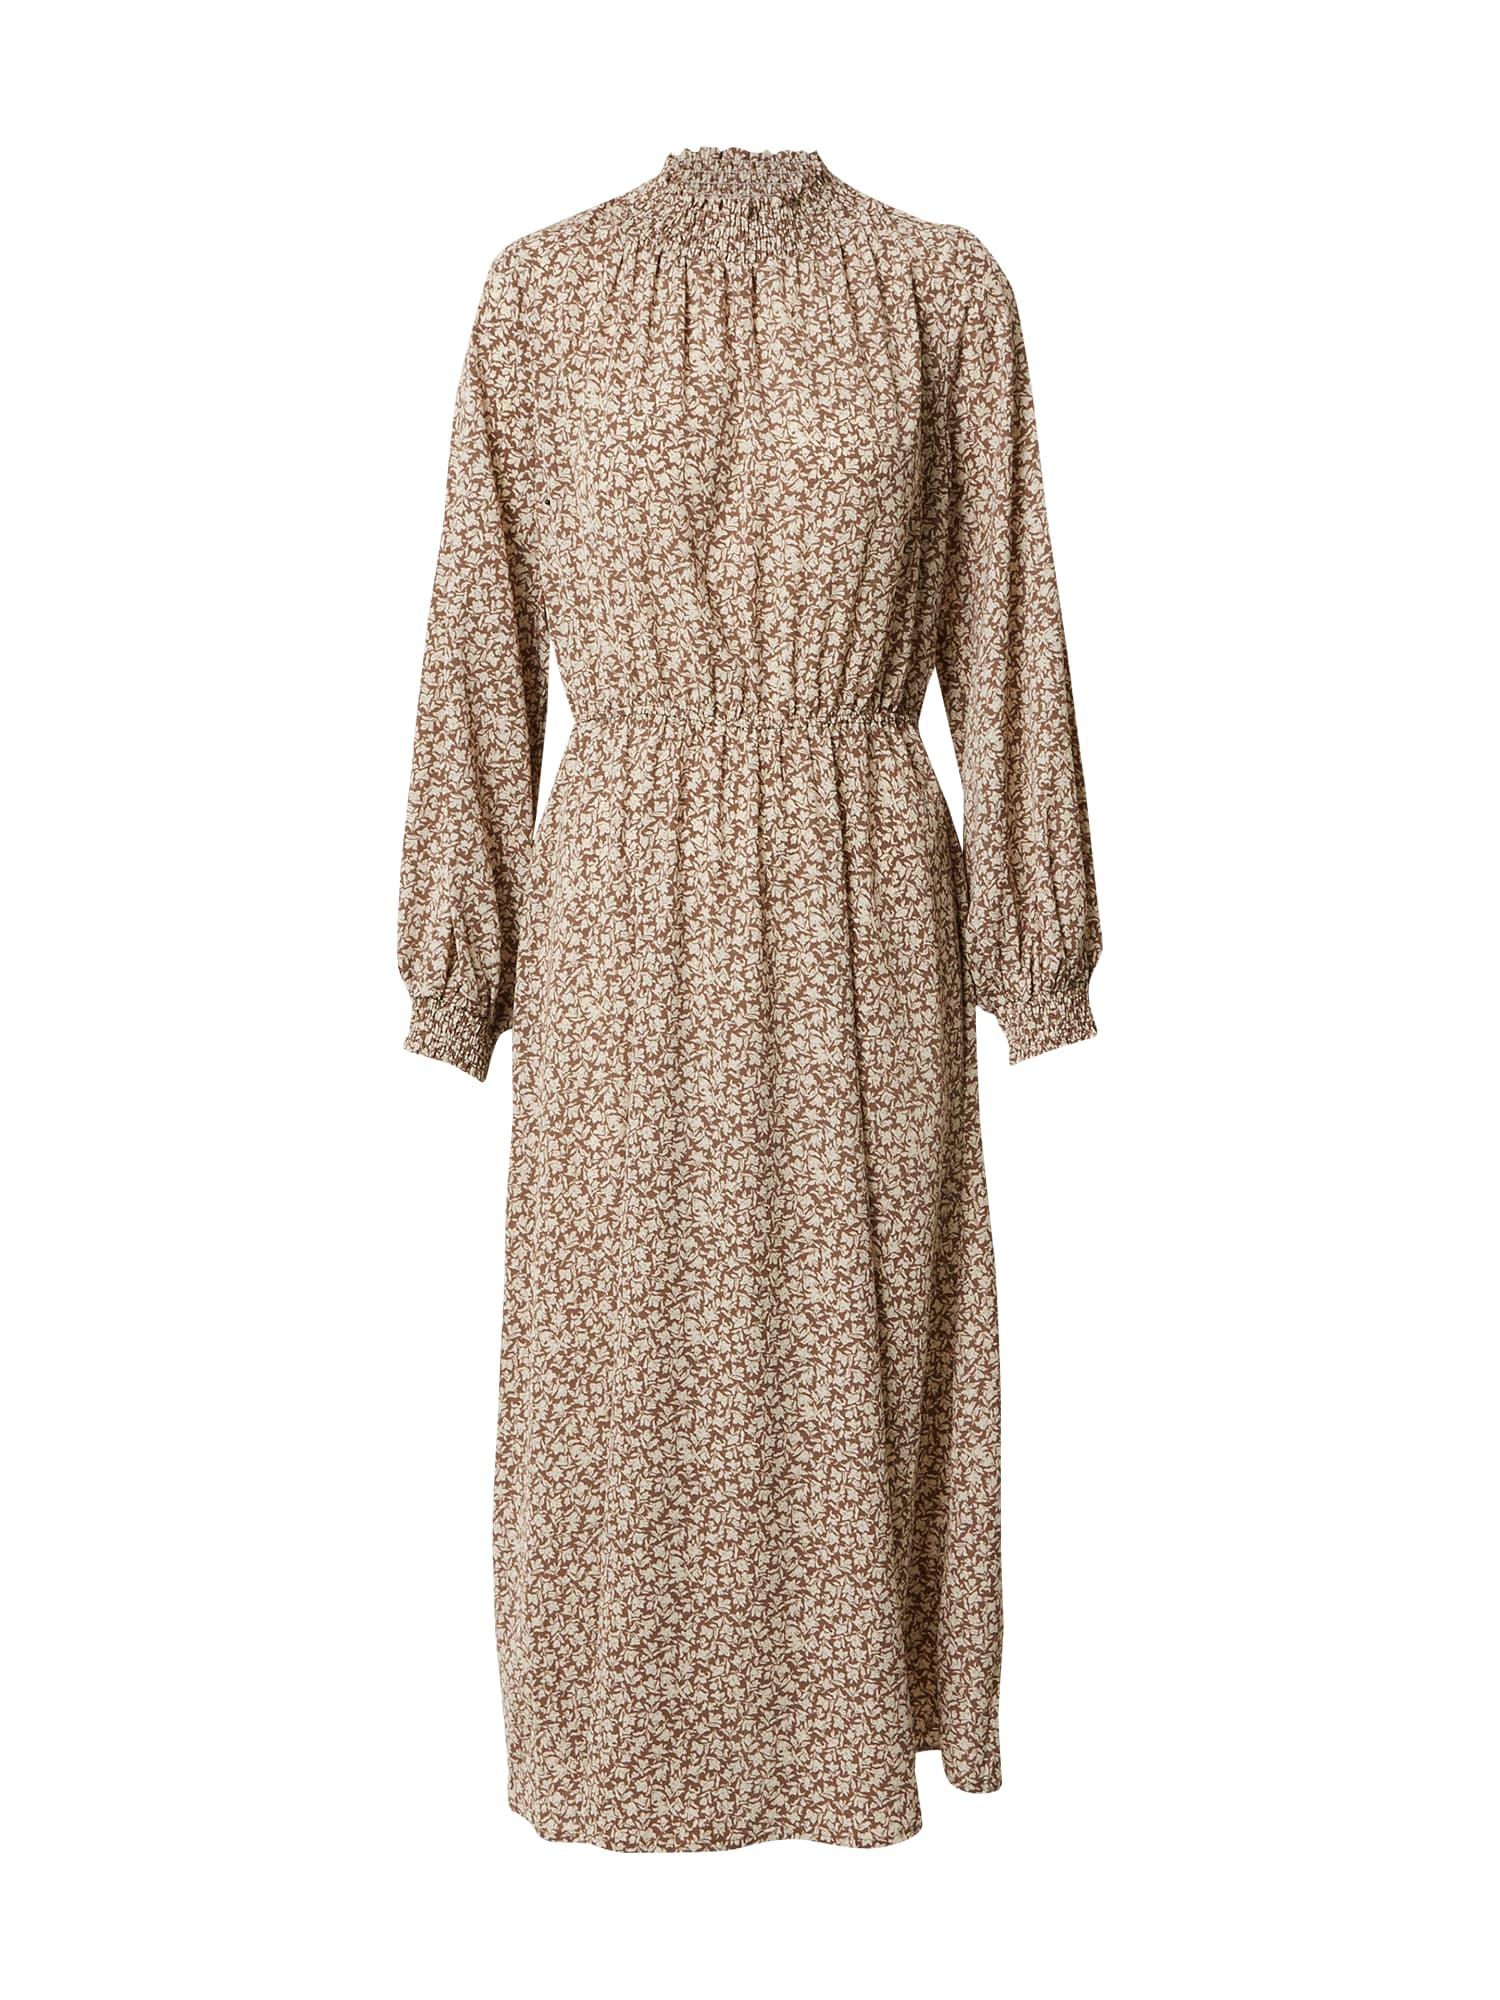 NÜMPH Suknelė